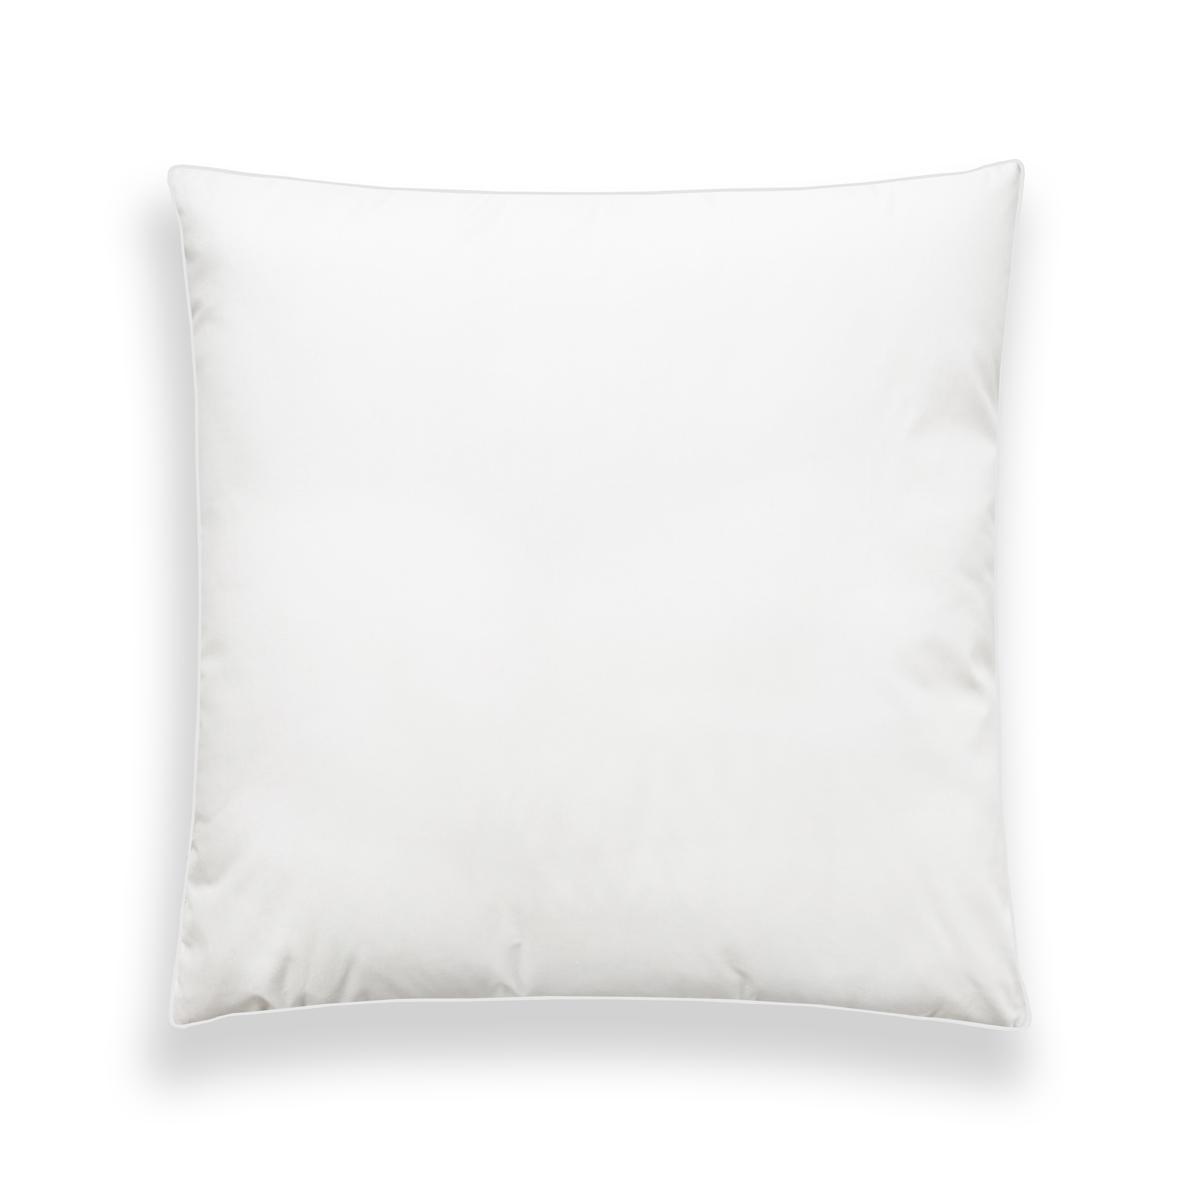 Oreiller FERME 10% Duvet Anti-acariens - Coton Bio  50x75 cm